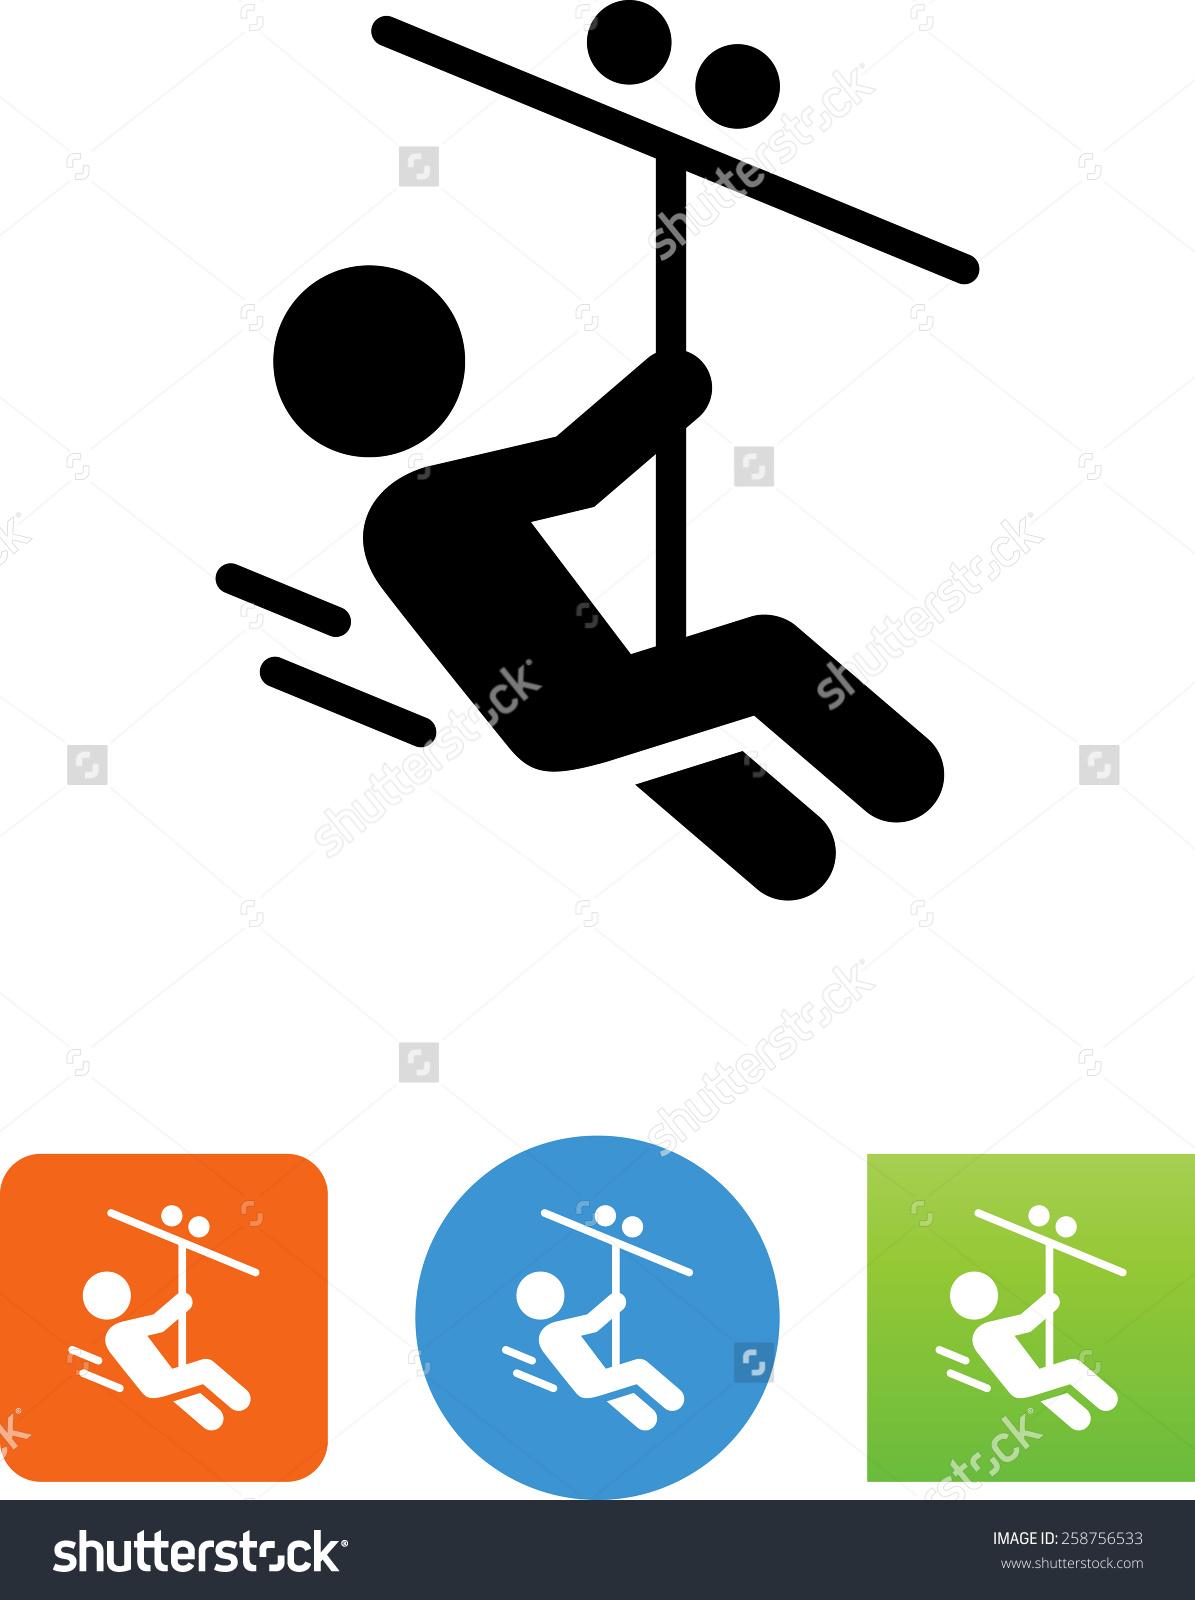 Person Riding Down Zip Line Vector Stock Vector 258756533.